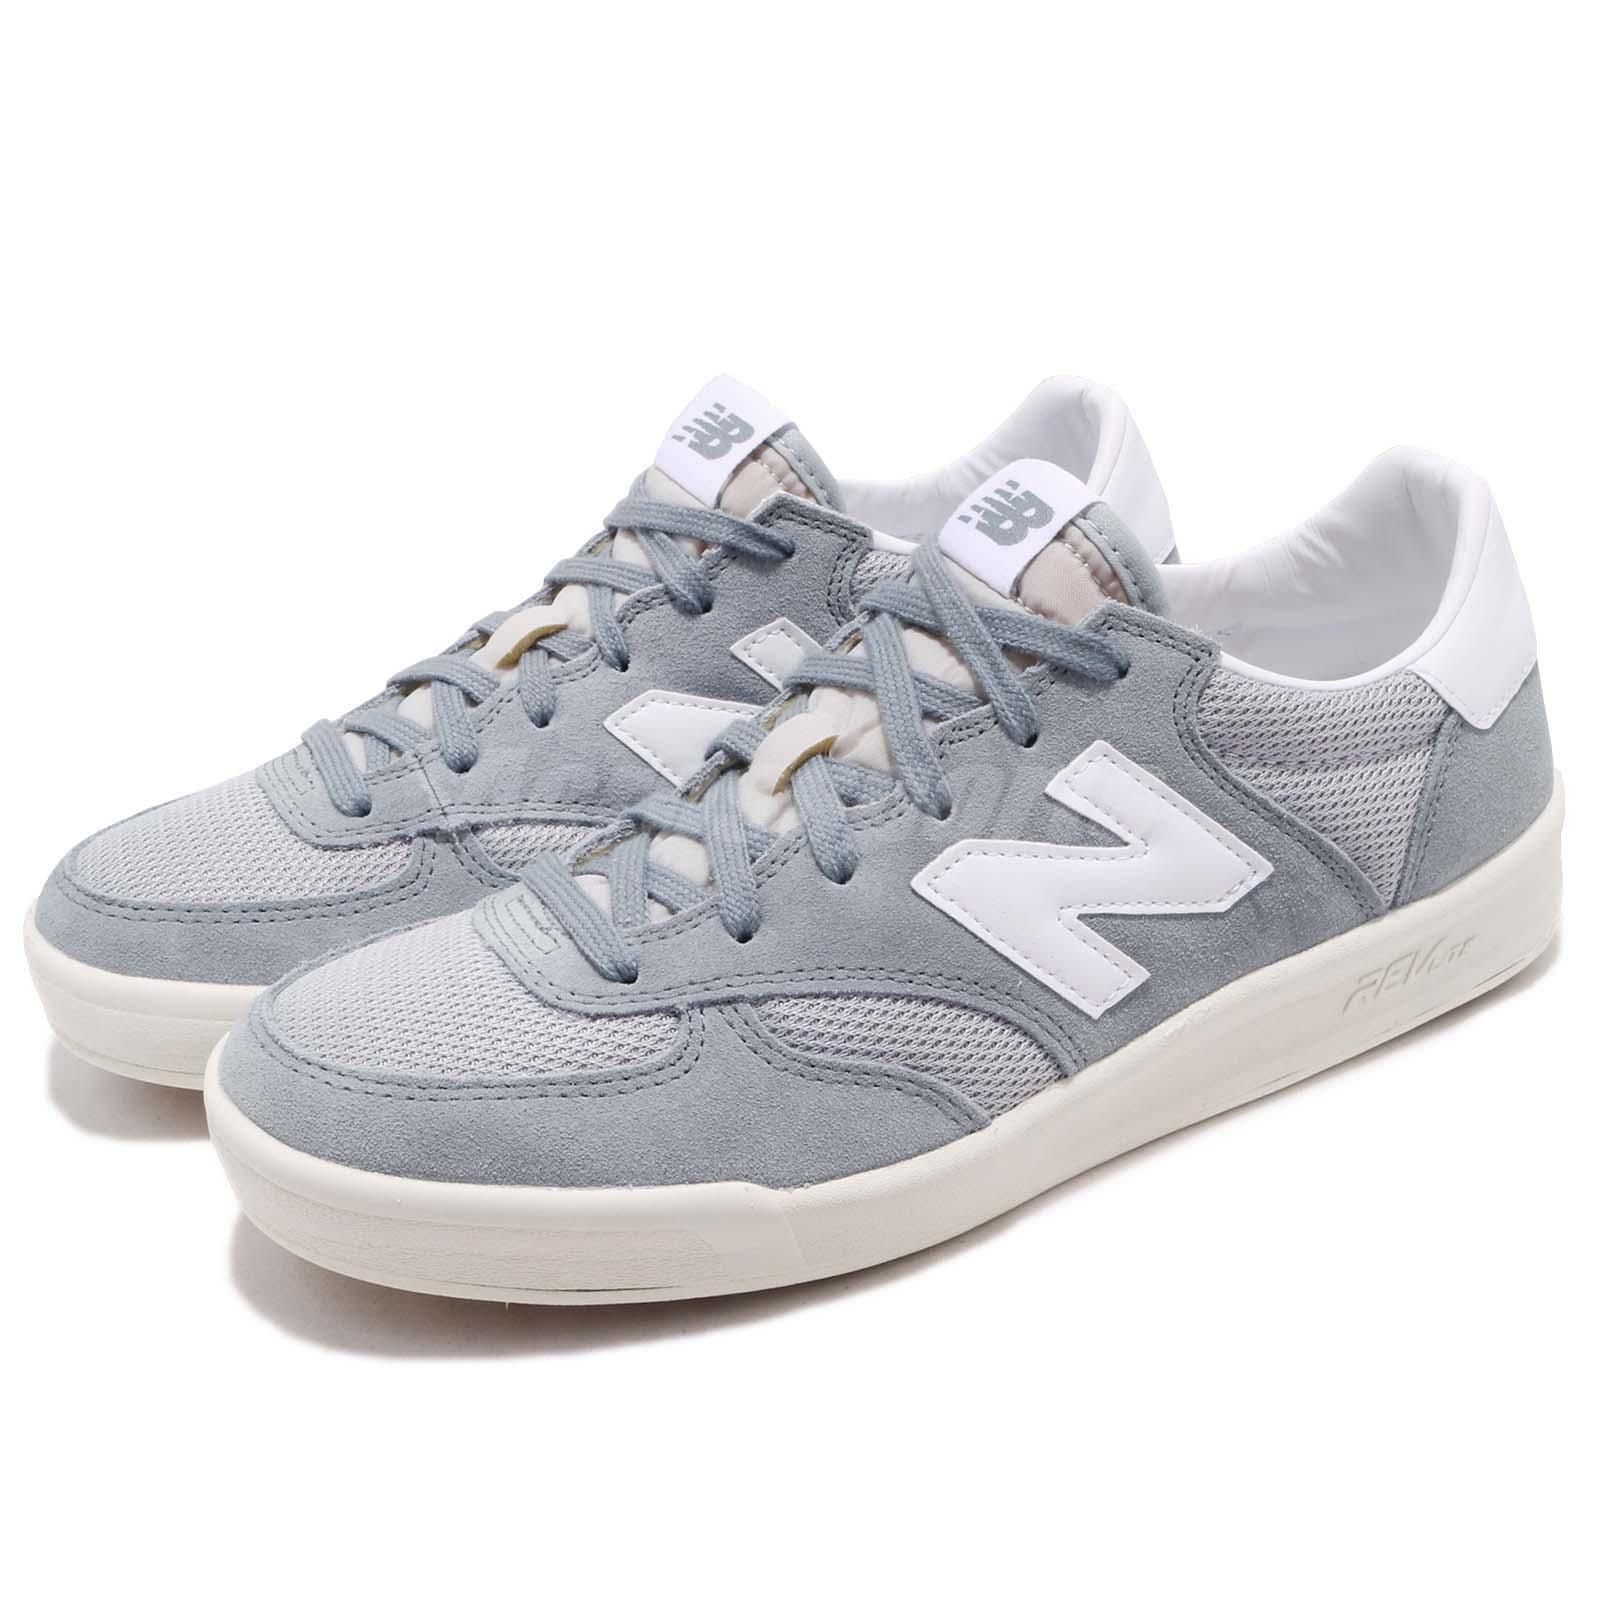 New Balance CRT300 300 Blue White Gum